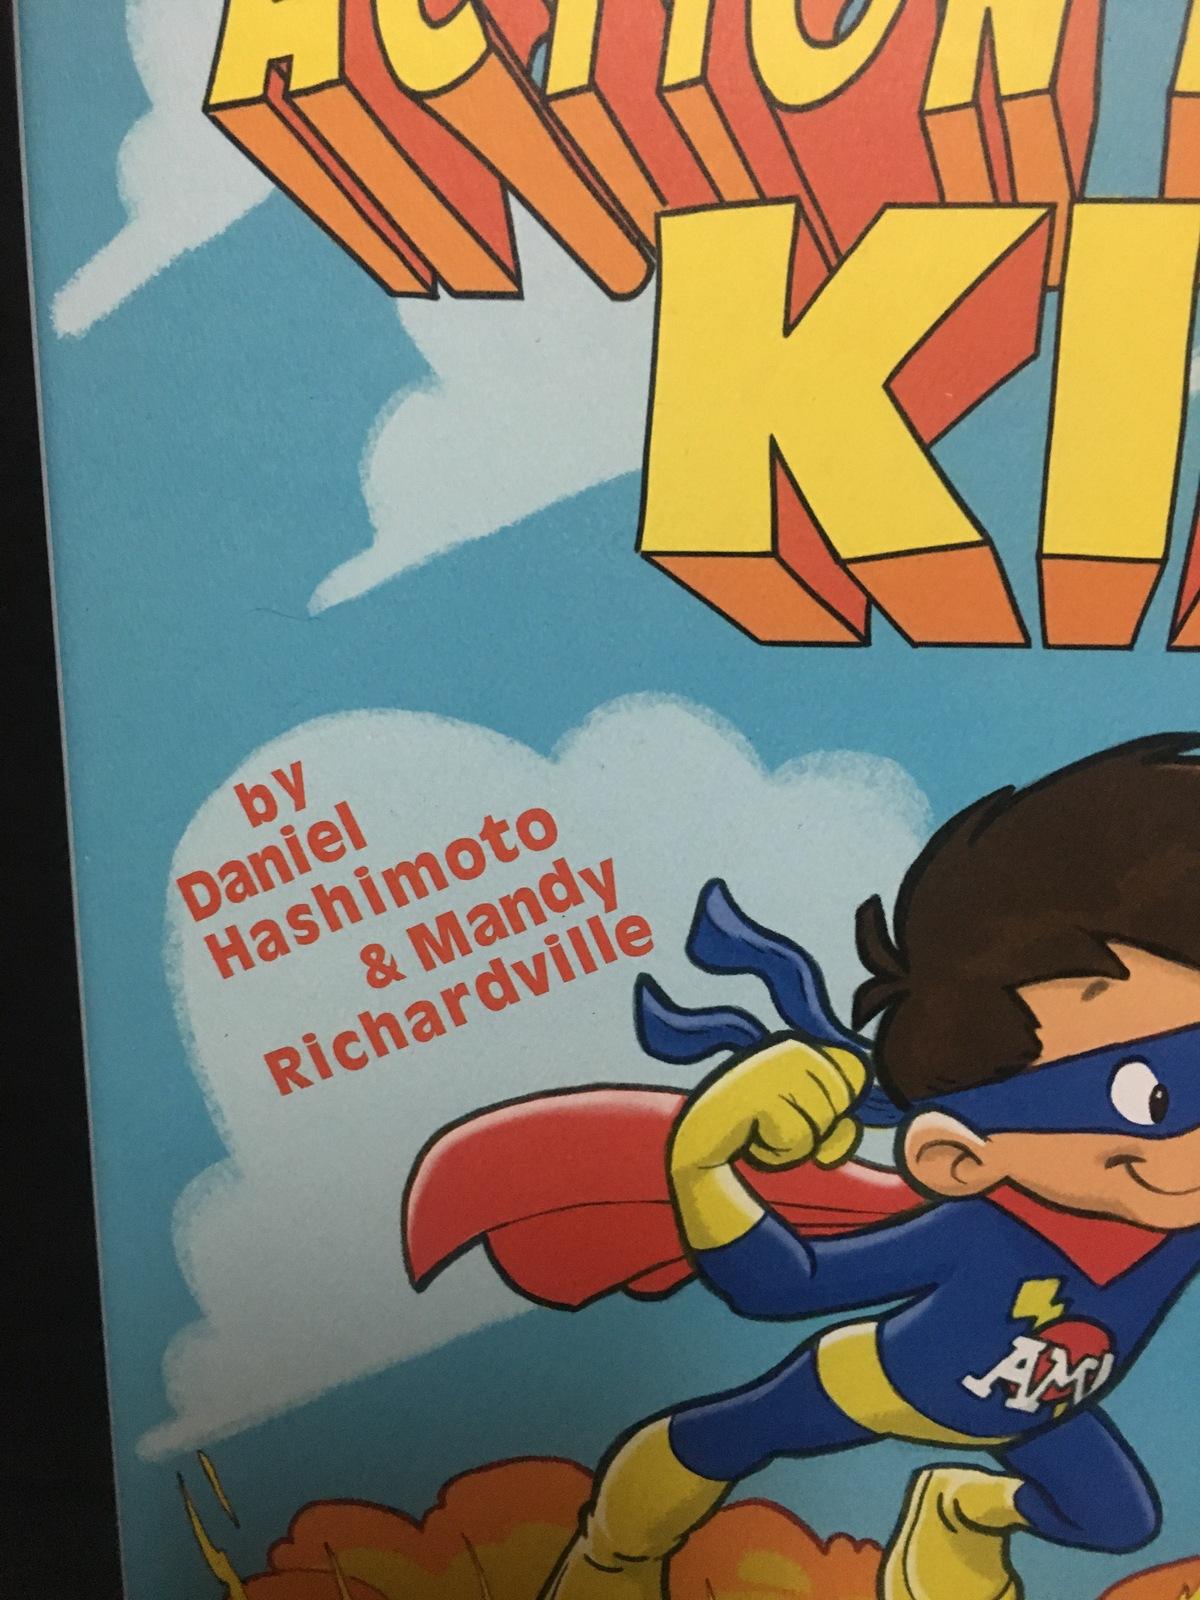 Action Movie Kid Interactive Illustrated Book Hard Cover Hashimoto, Richardville